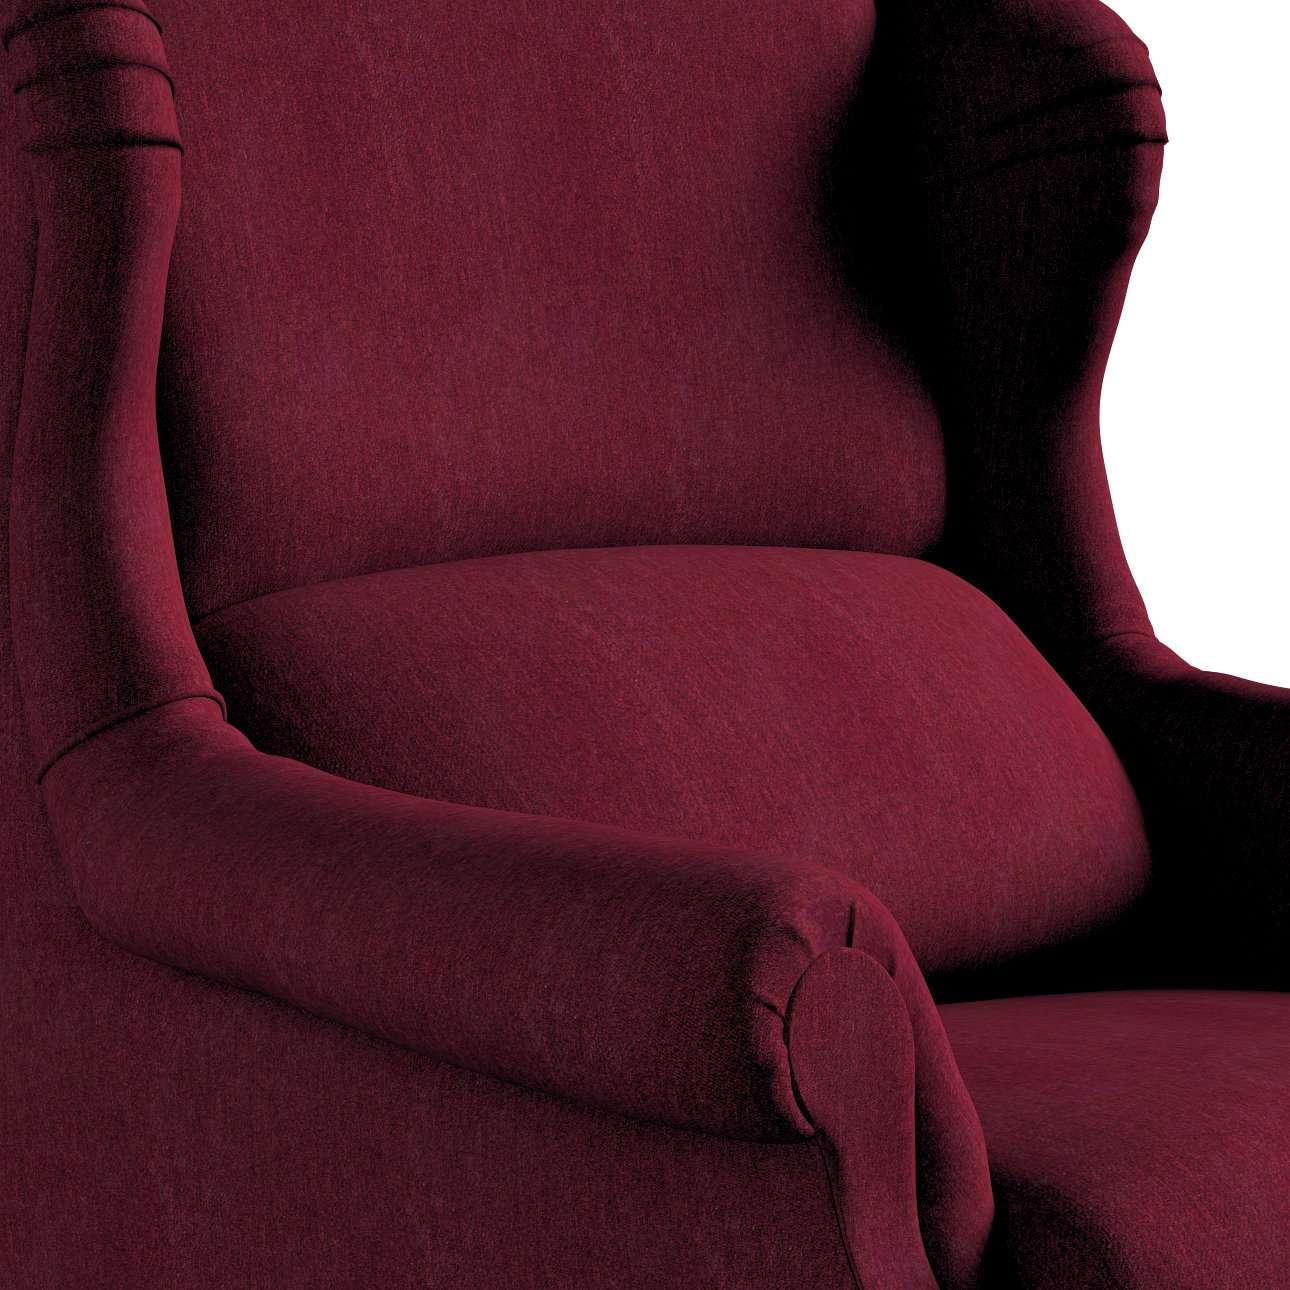 Stilingas Dekoria fotelis 63 x 115 cm kolekcijoje Chenille, audinys: 702-19